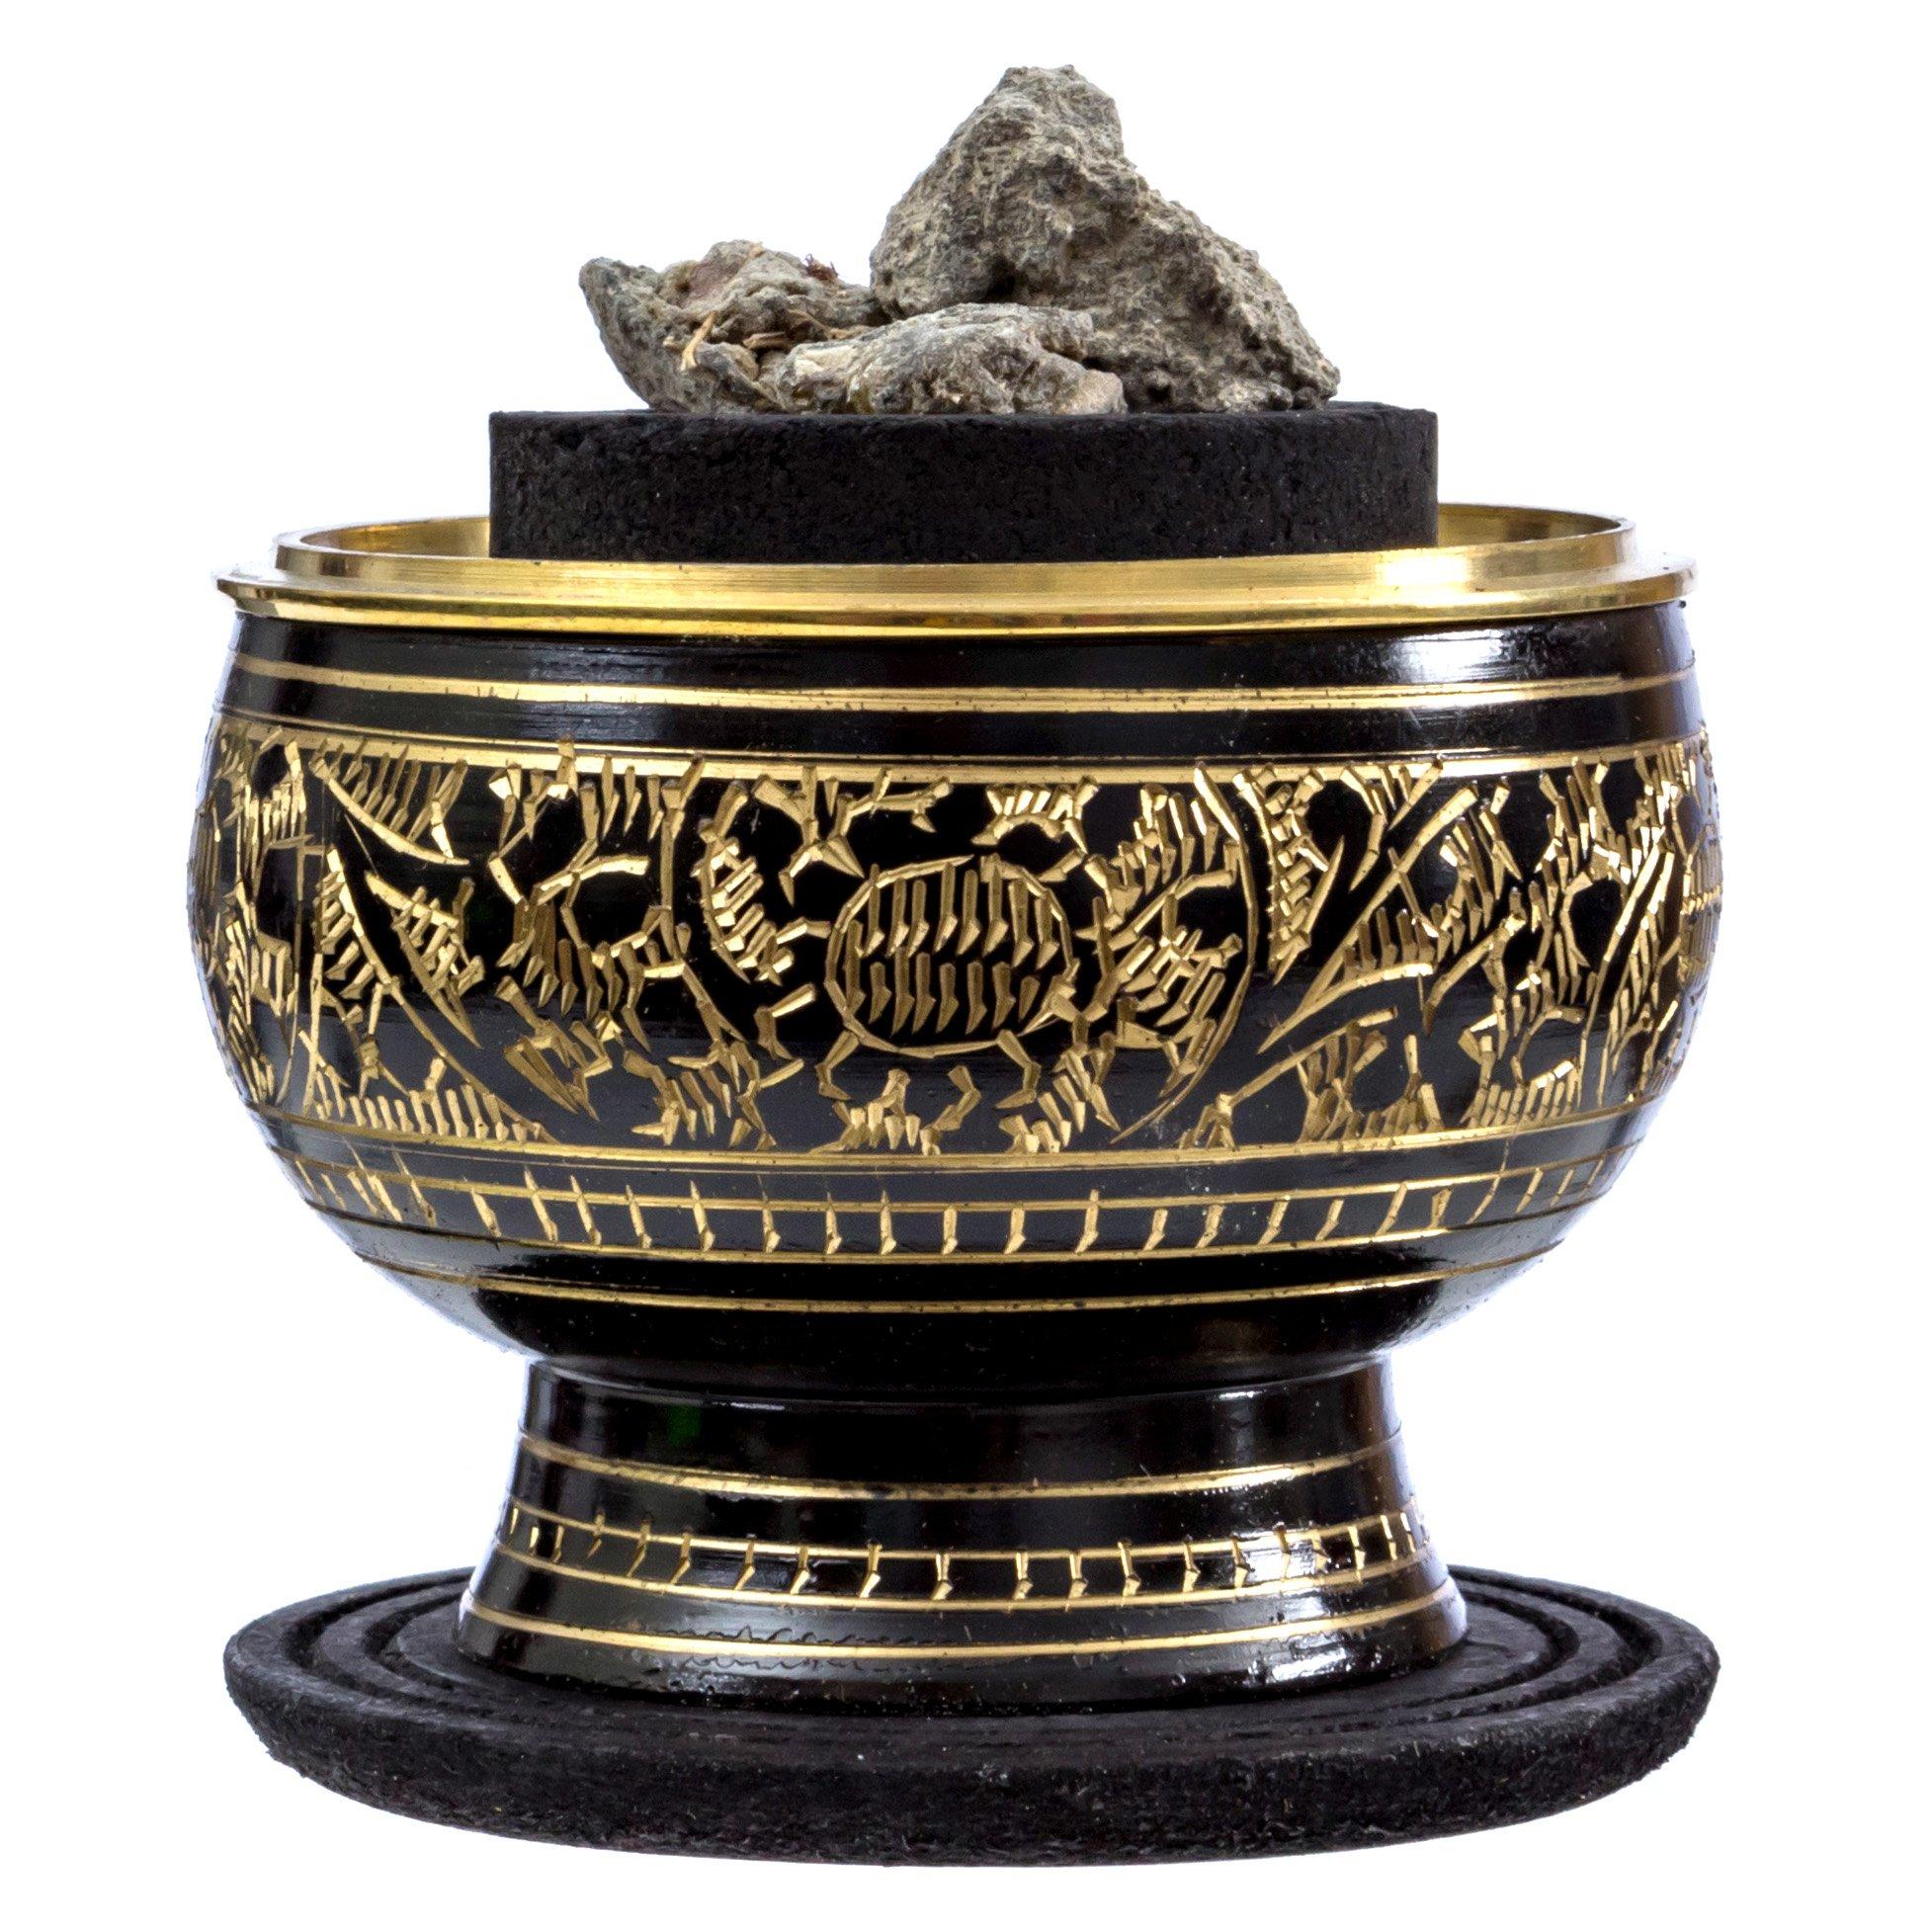 Alternative Imagination Palo Santo Resin Burning Kits (Black Brass Burner)